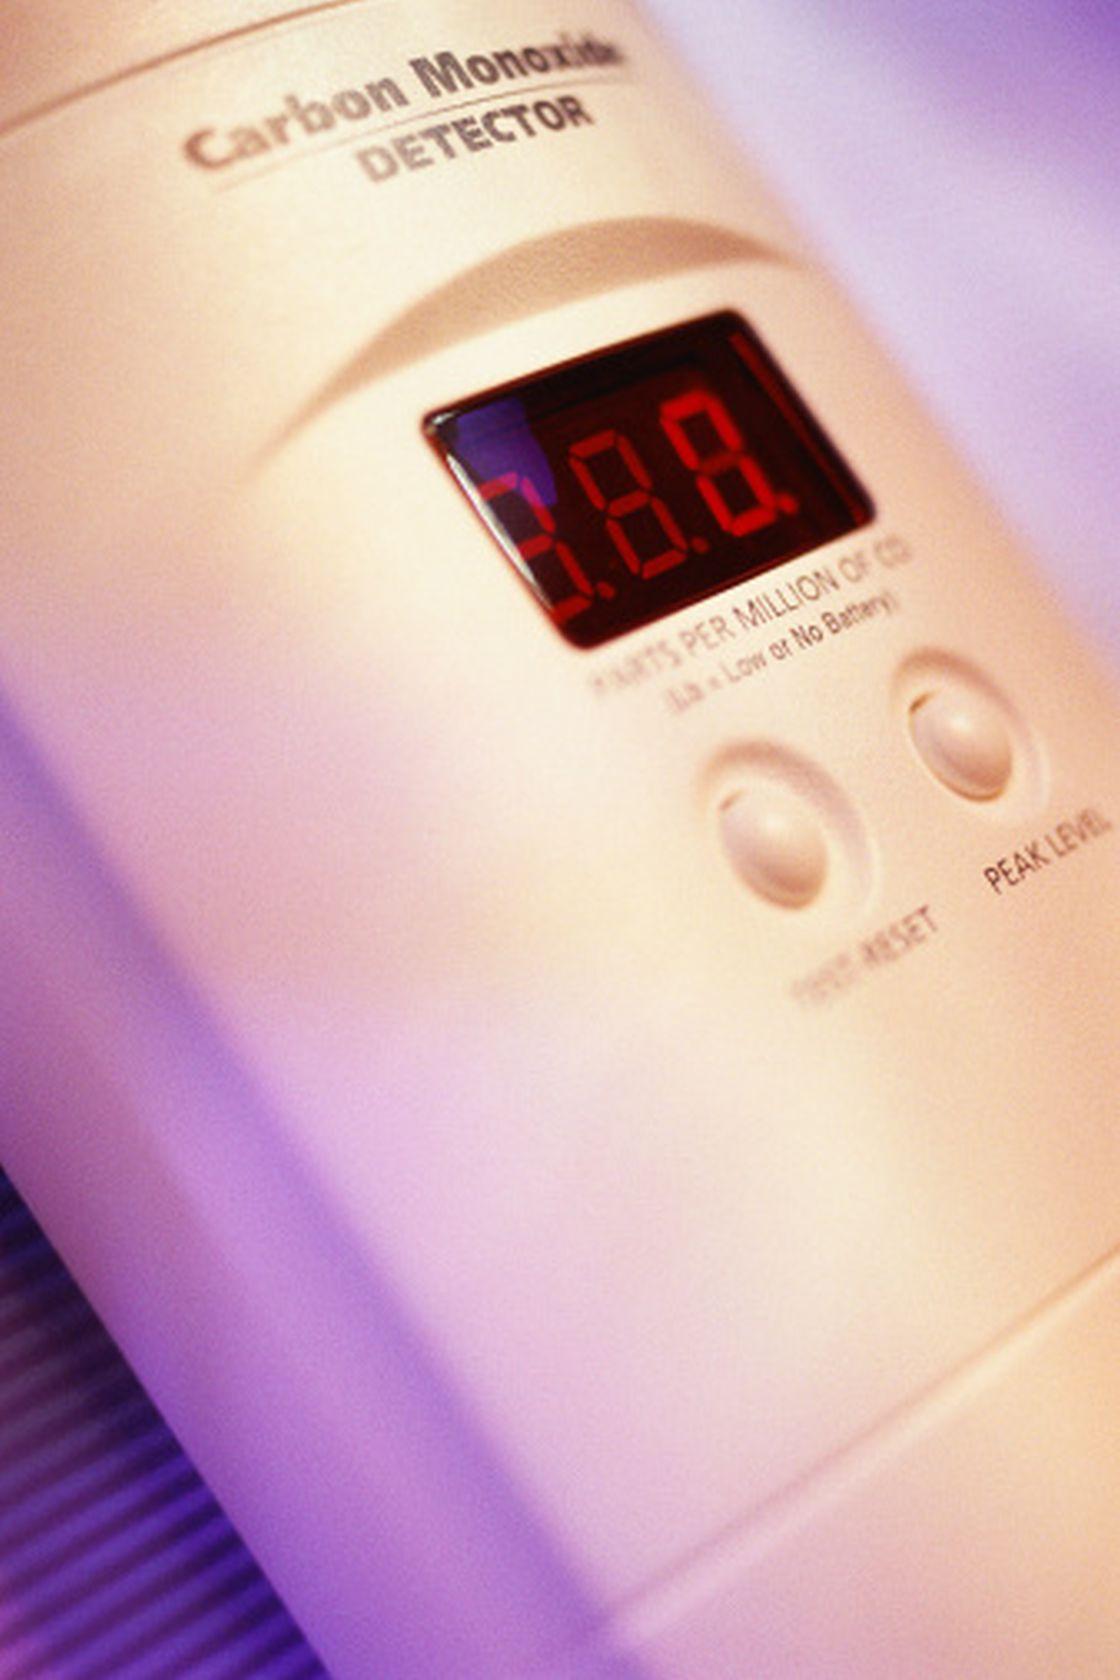 A Digital carbon monoxide detector.